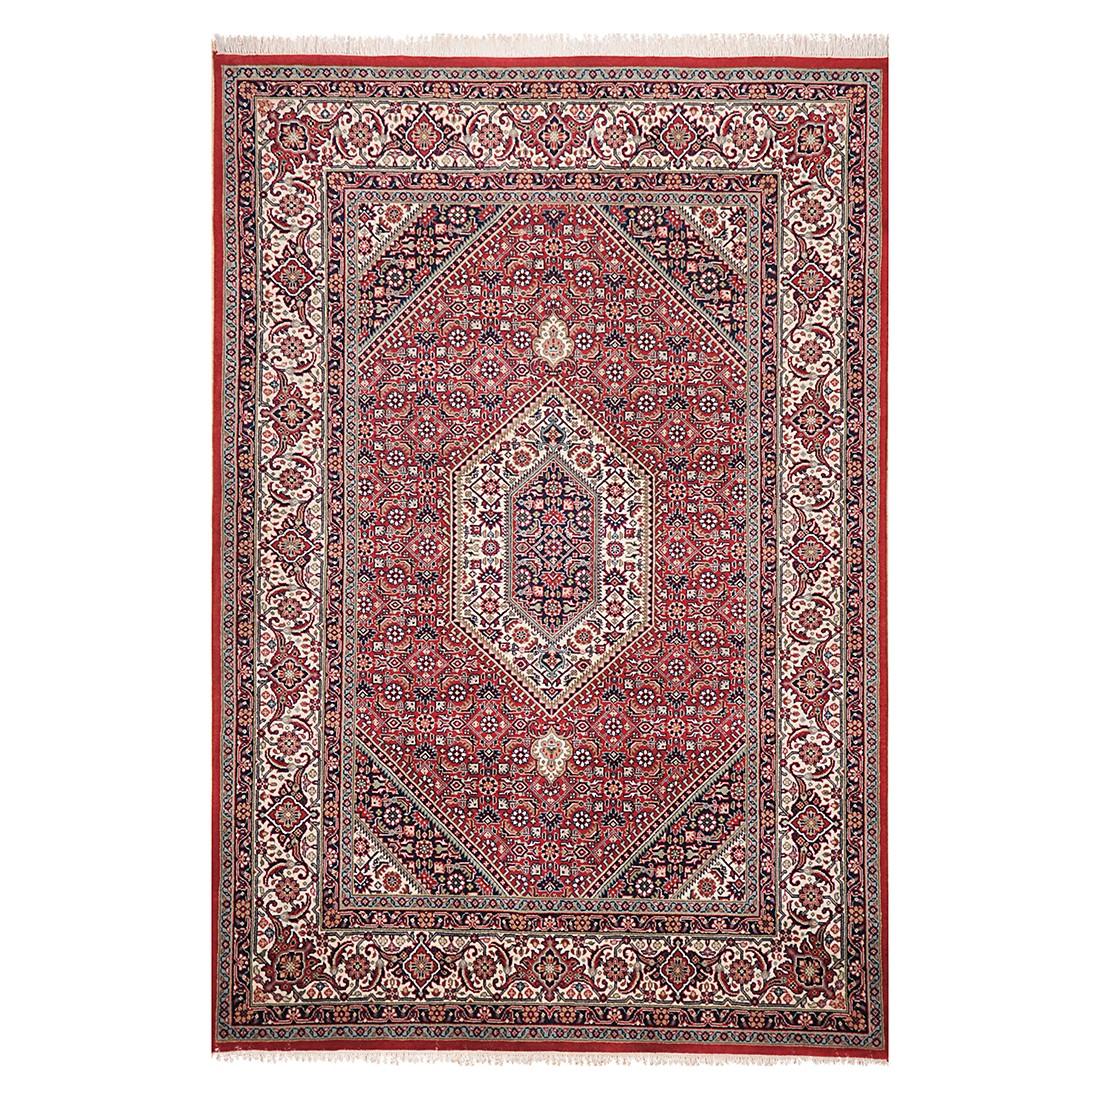 Teppich Sirsa Seta Bidjar - Seide/Rot - 250 cm x 350 cm, Theko die markenteppiche